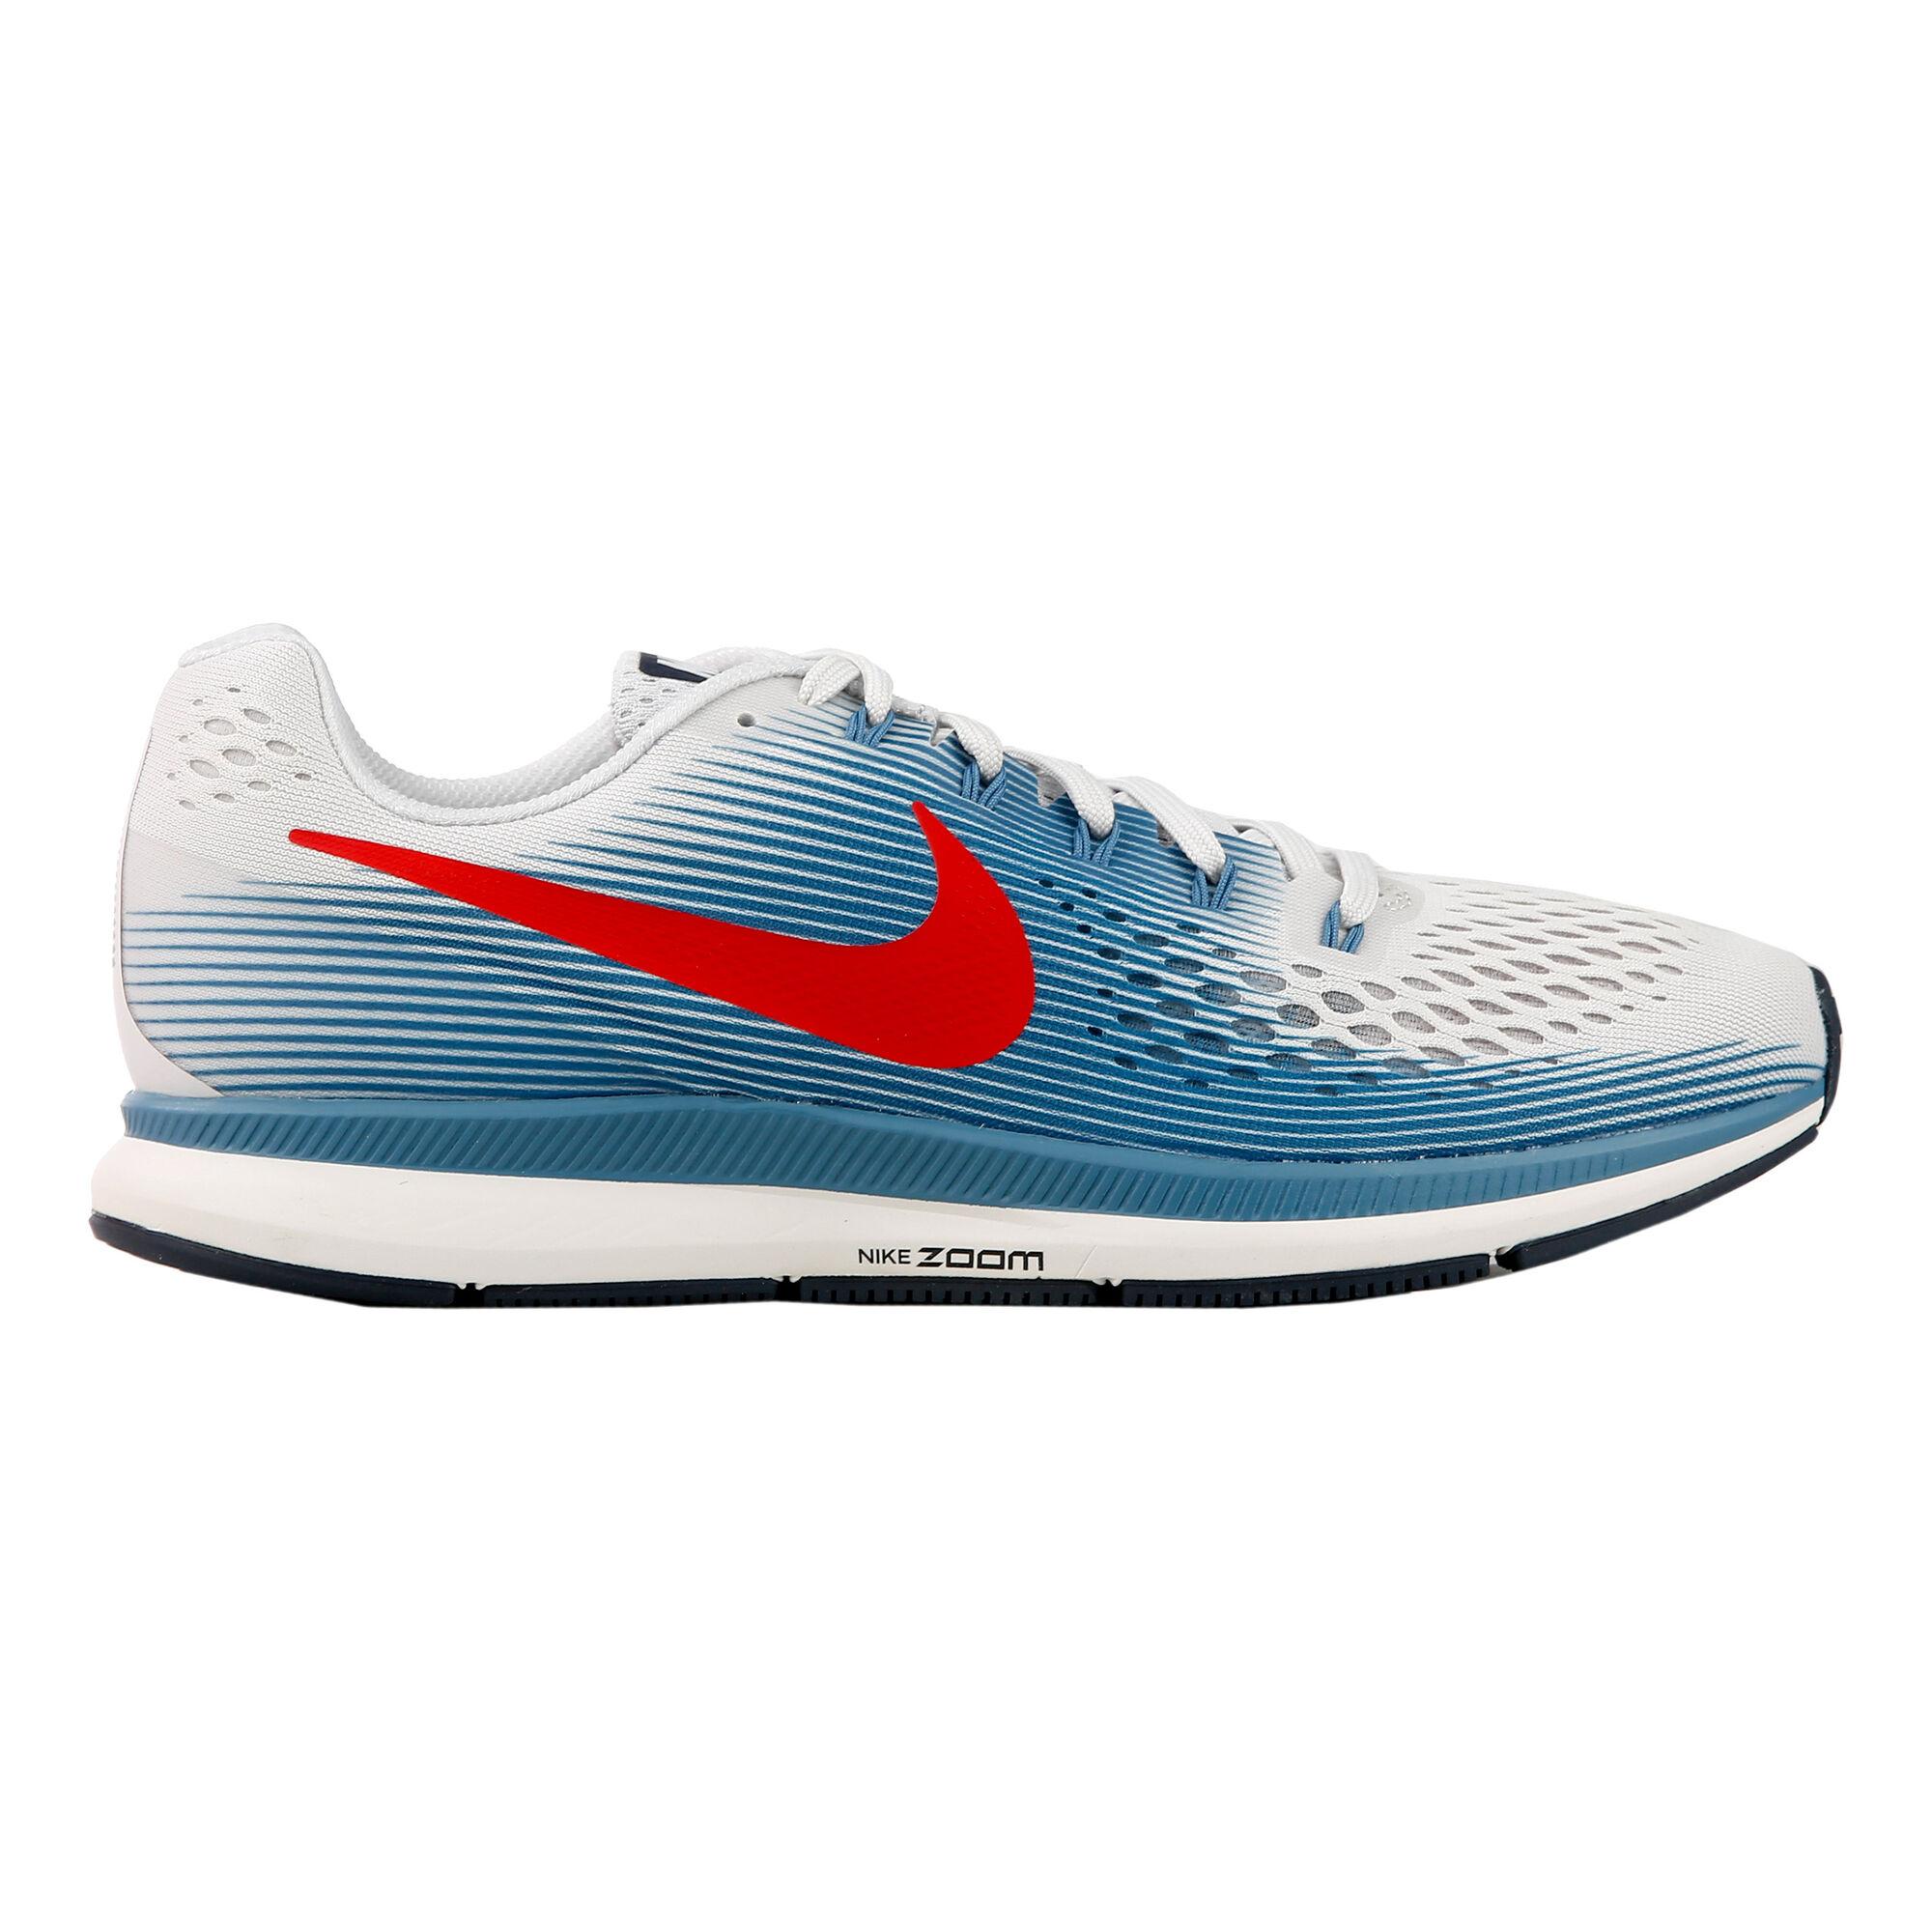 cea7246130cf0 buy Nike Air Zoom Pegasus 34 Neutral Running Shoe Men - White